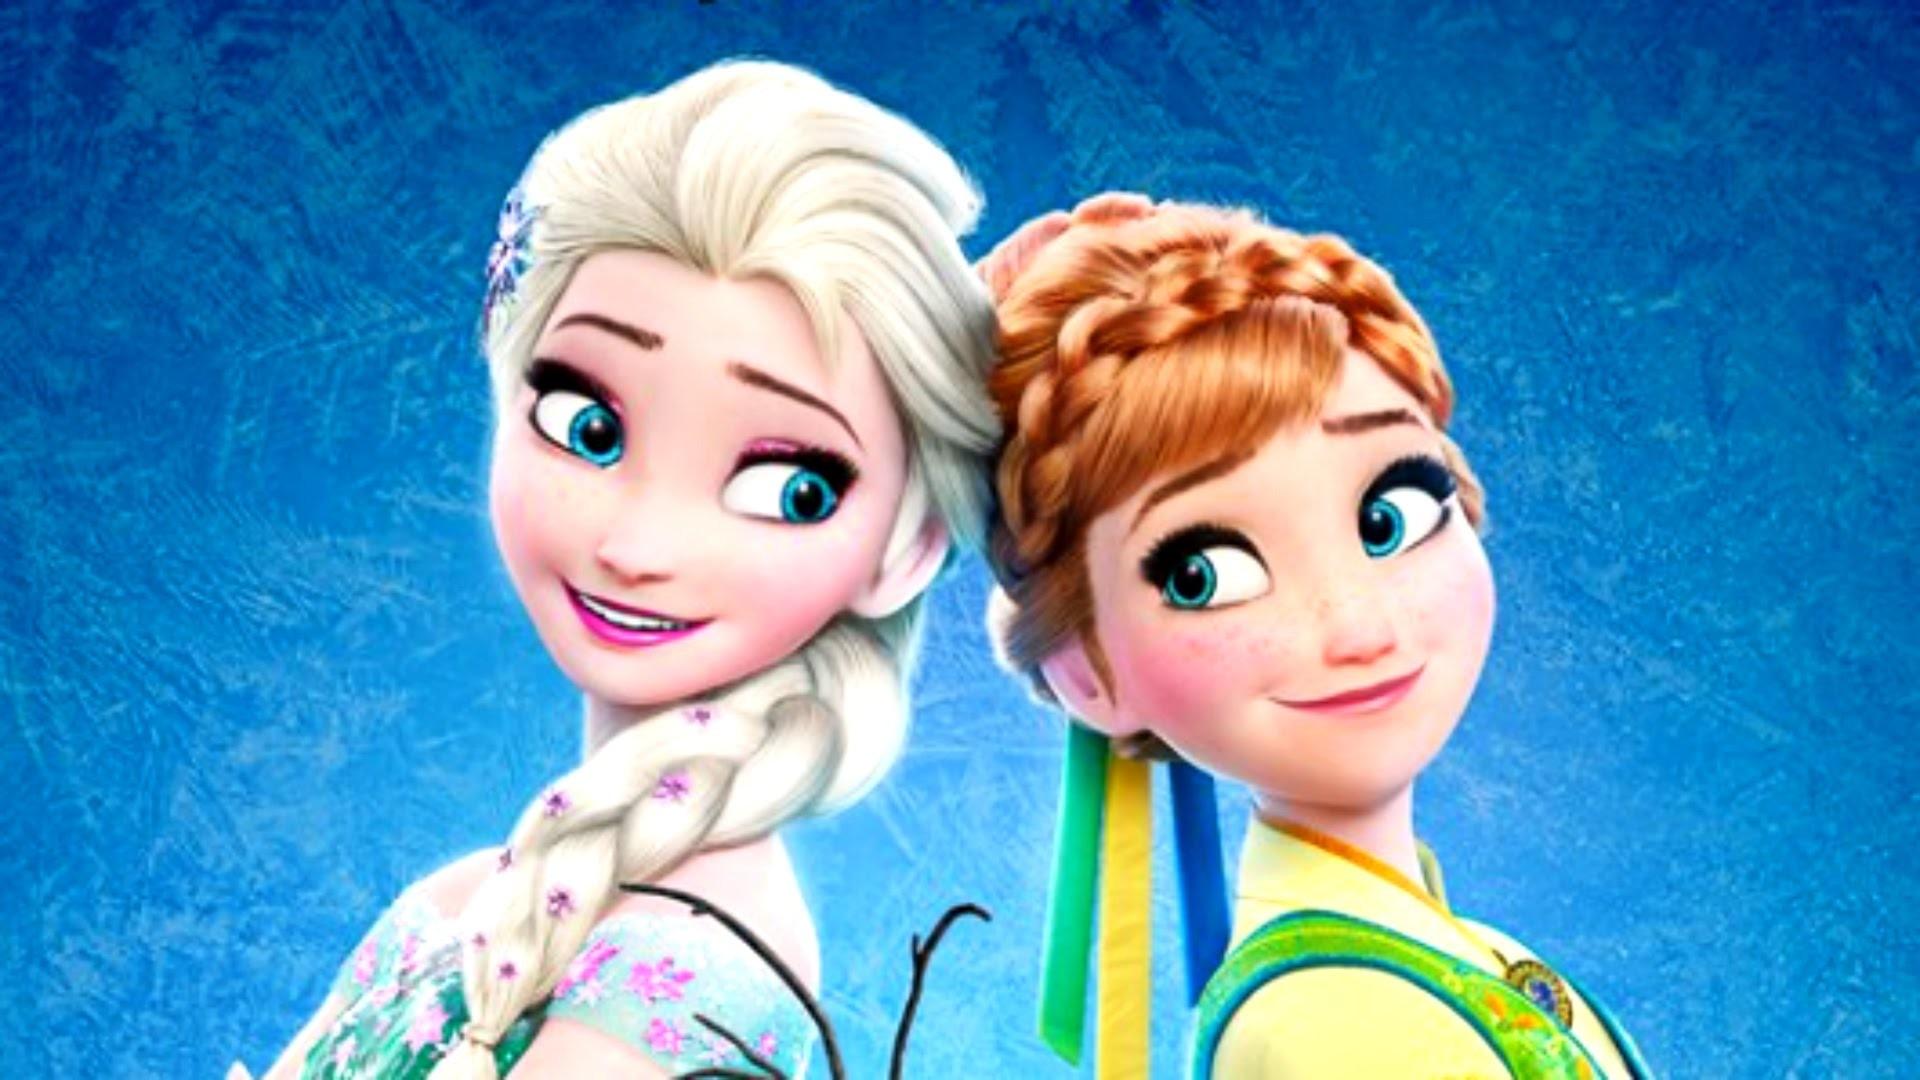 Frozen Fever Elsa Wallpaper 74 Images